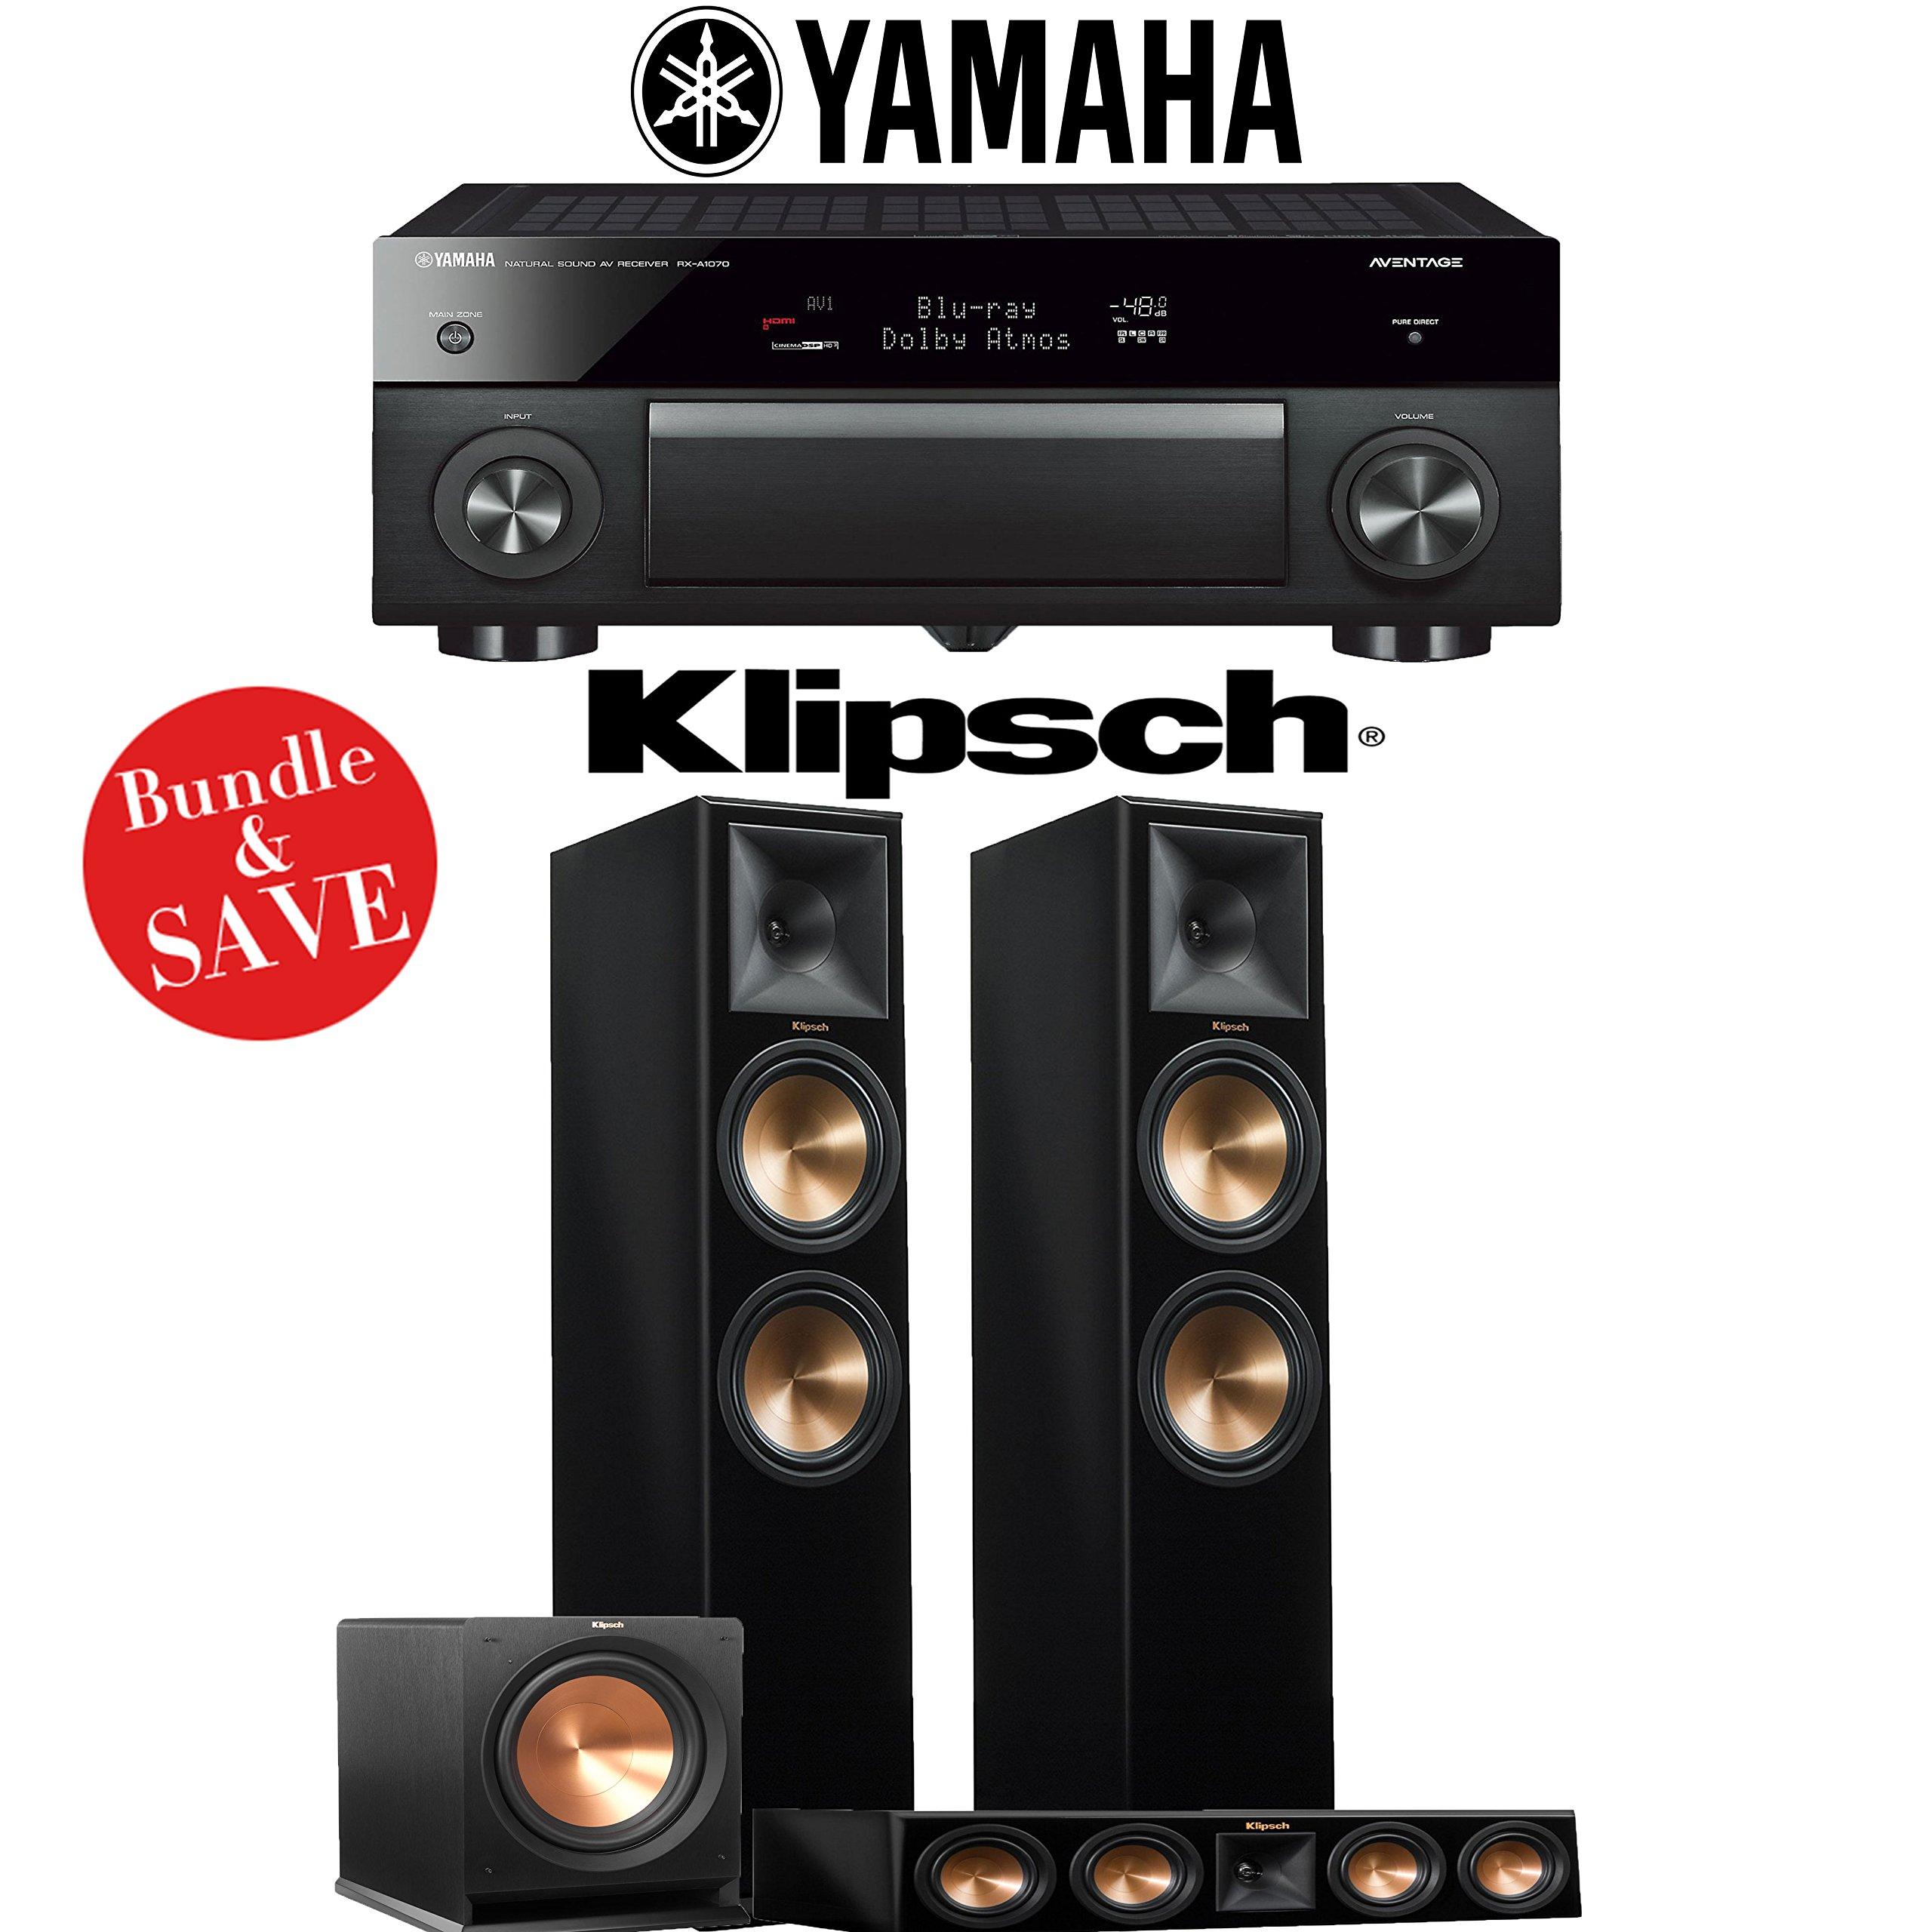 Yamaha AVENTAGE RX-A1070BL 7.2-Ch 4K Network AV Receiver + Klipsch RP-280F + Klipsch RP-440C + Klipsch R-112SW - 3.1-Ch Home Theater Package (Piano Black) by Klipsch